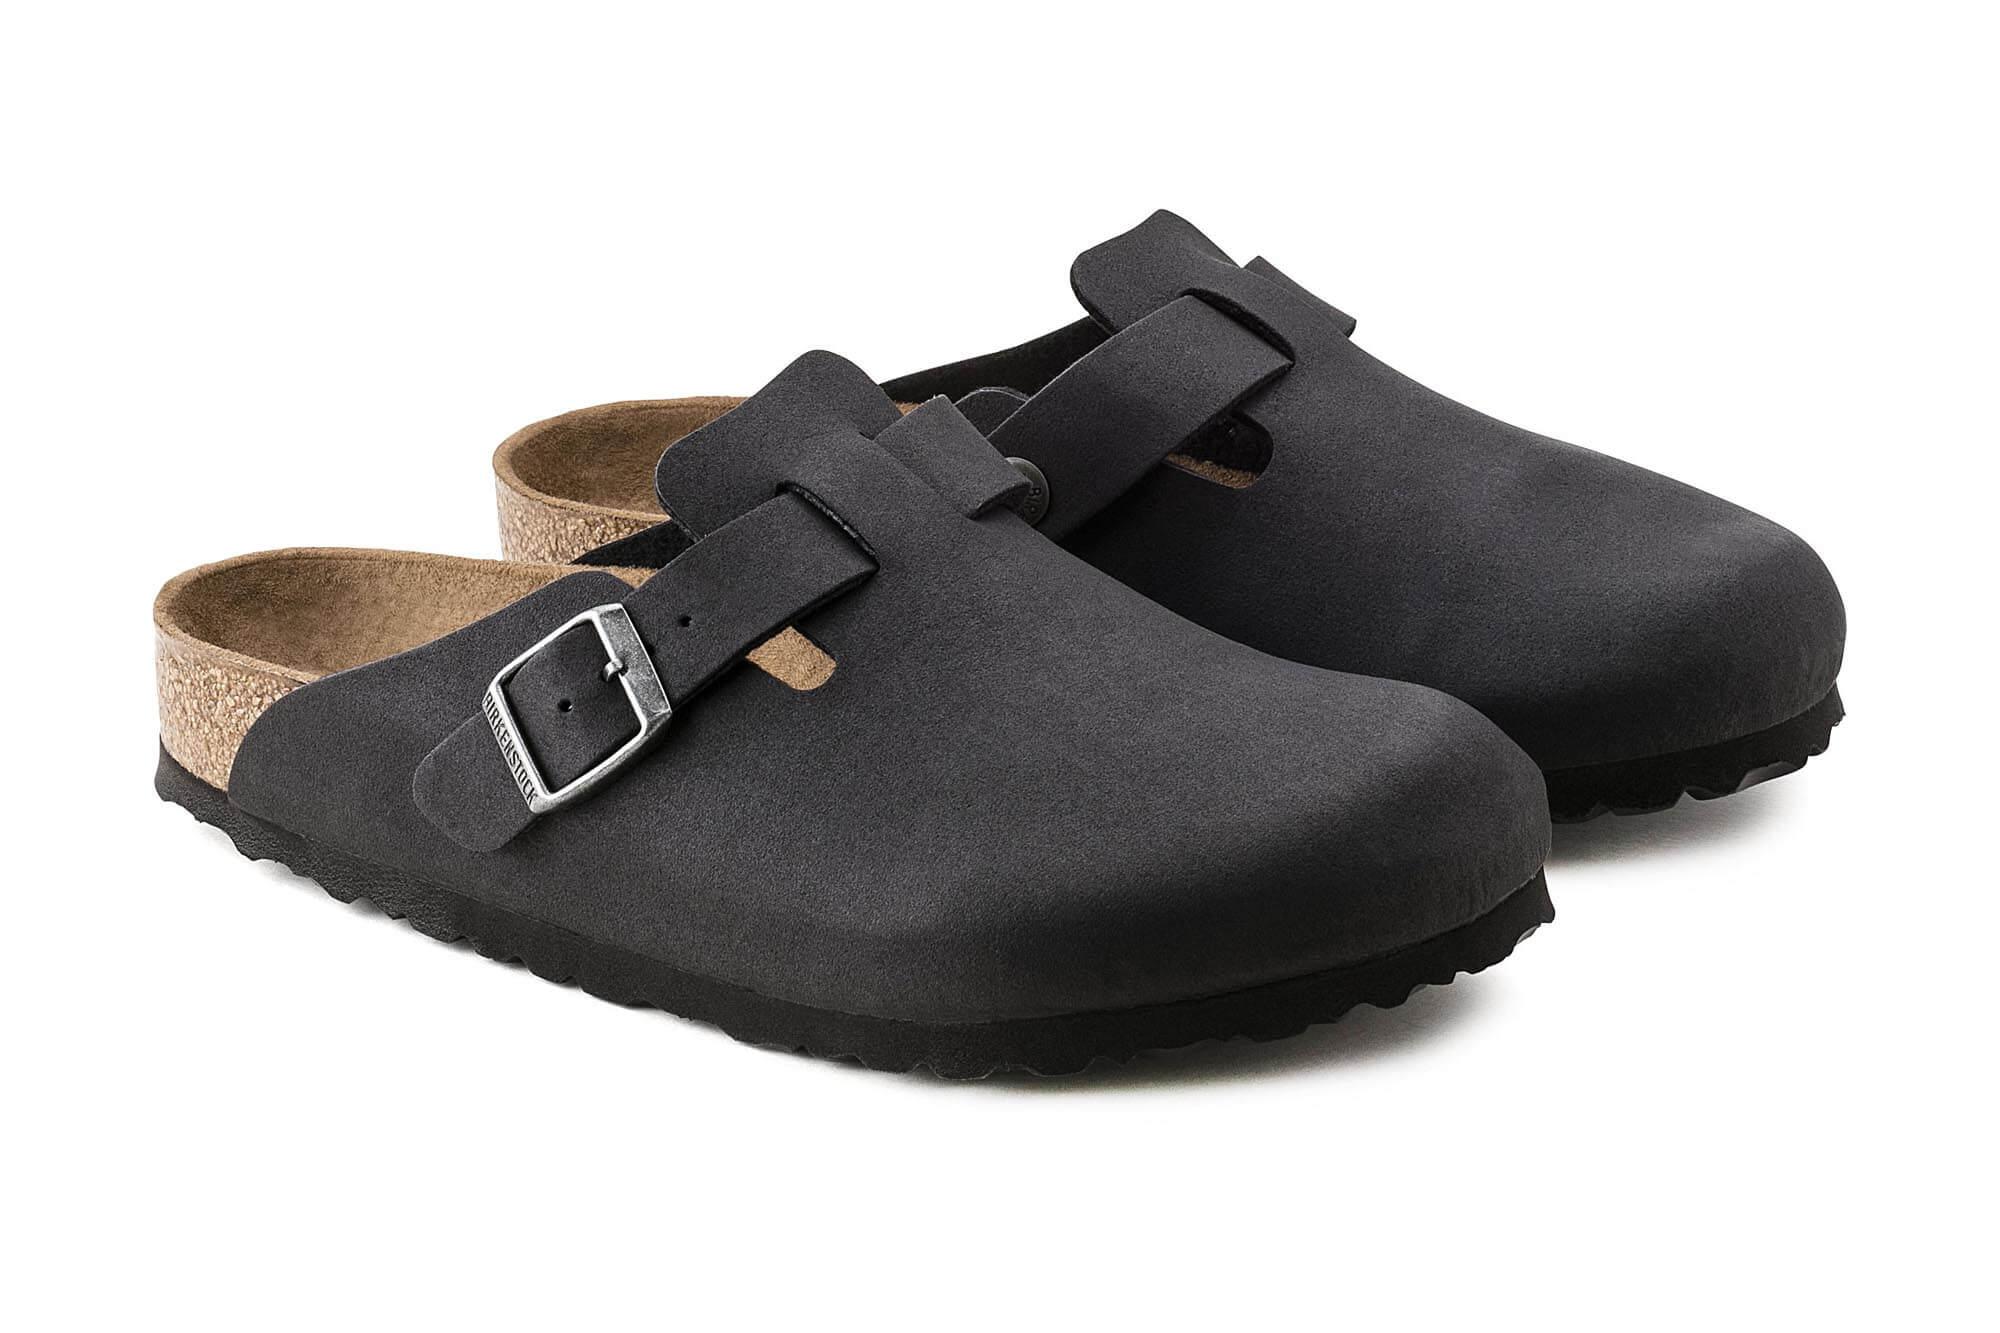 Vegan Leather Shoe Brands